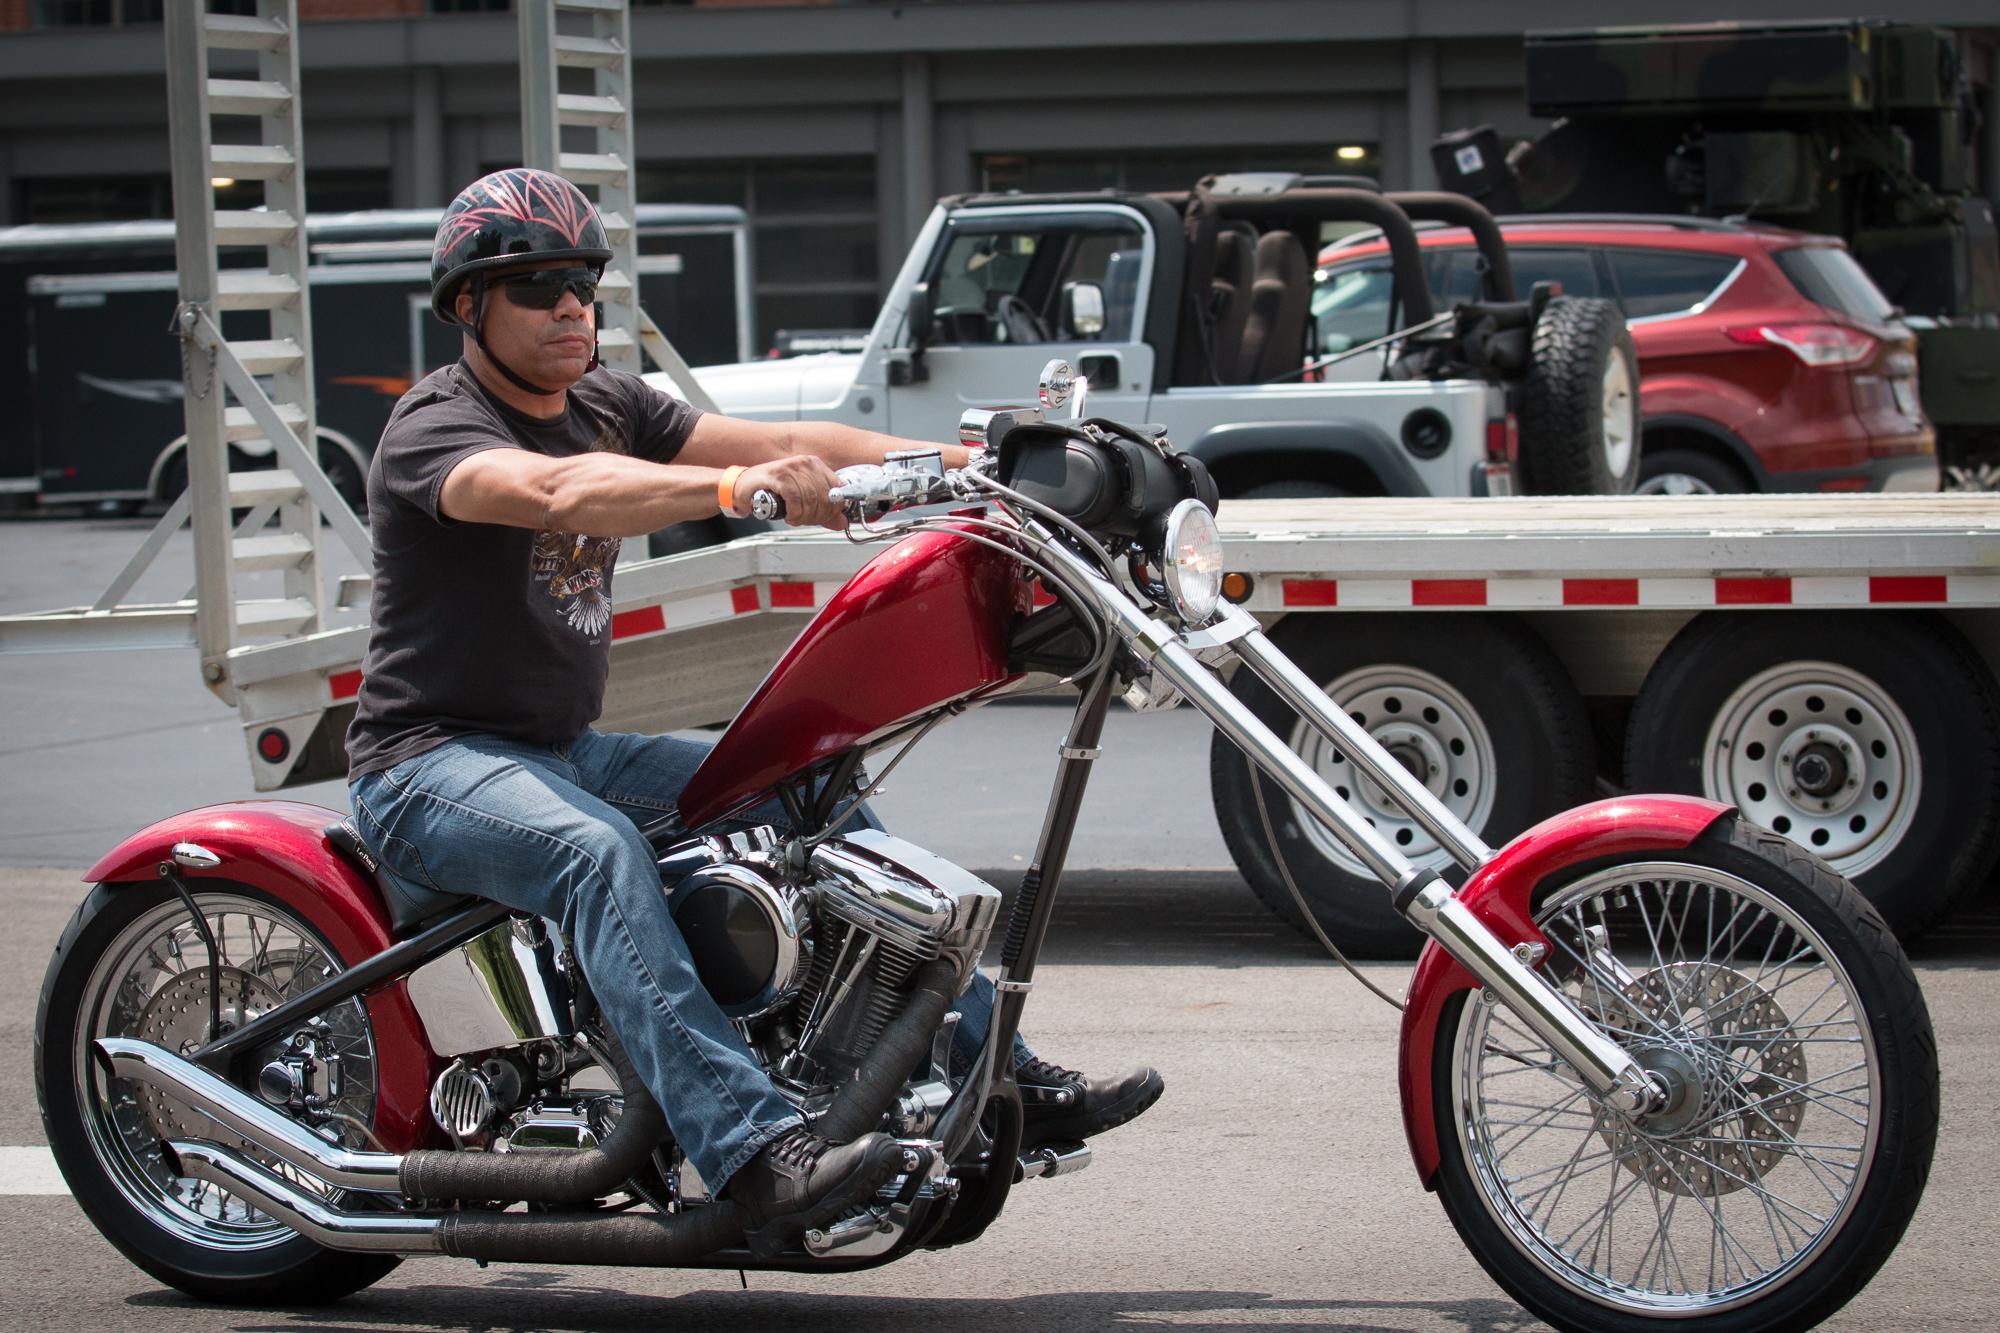 059_bikes.jpg